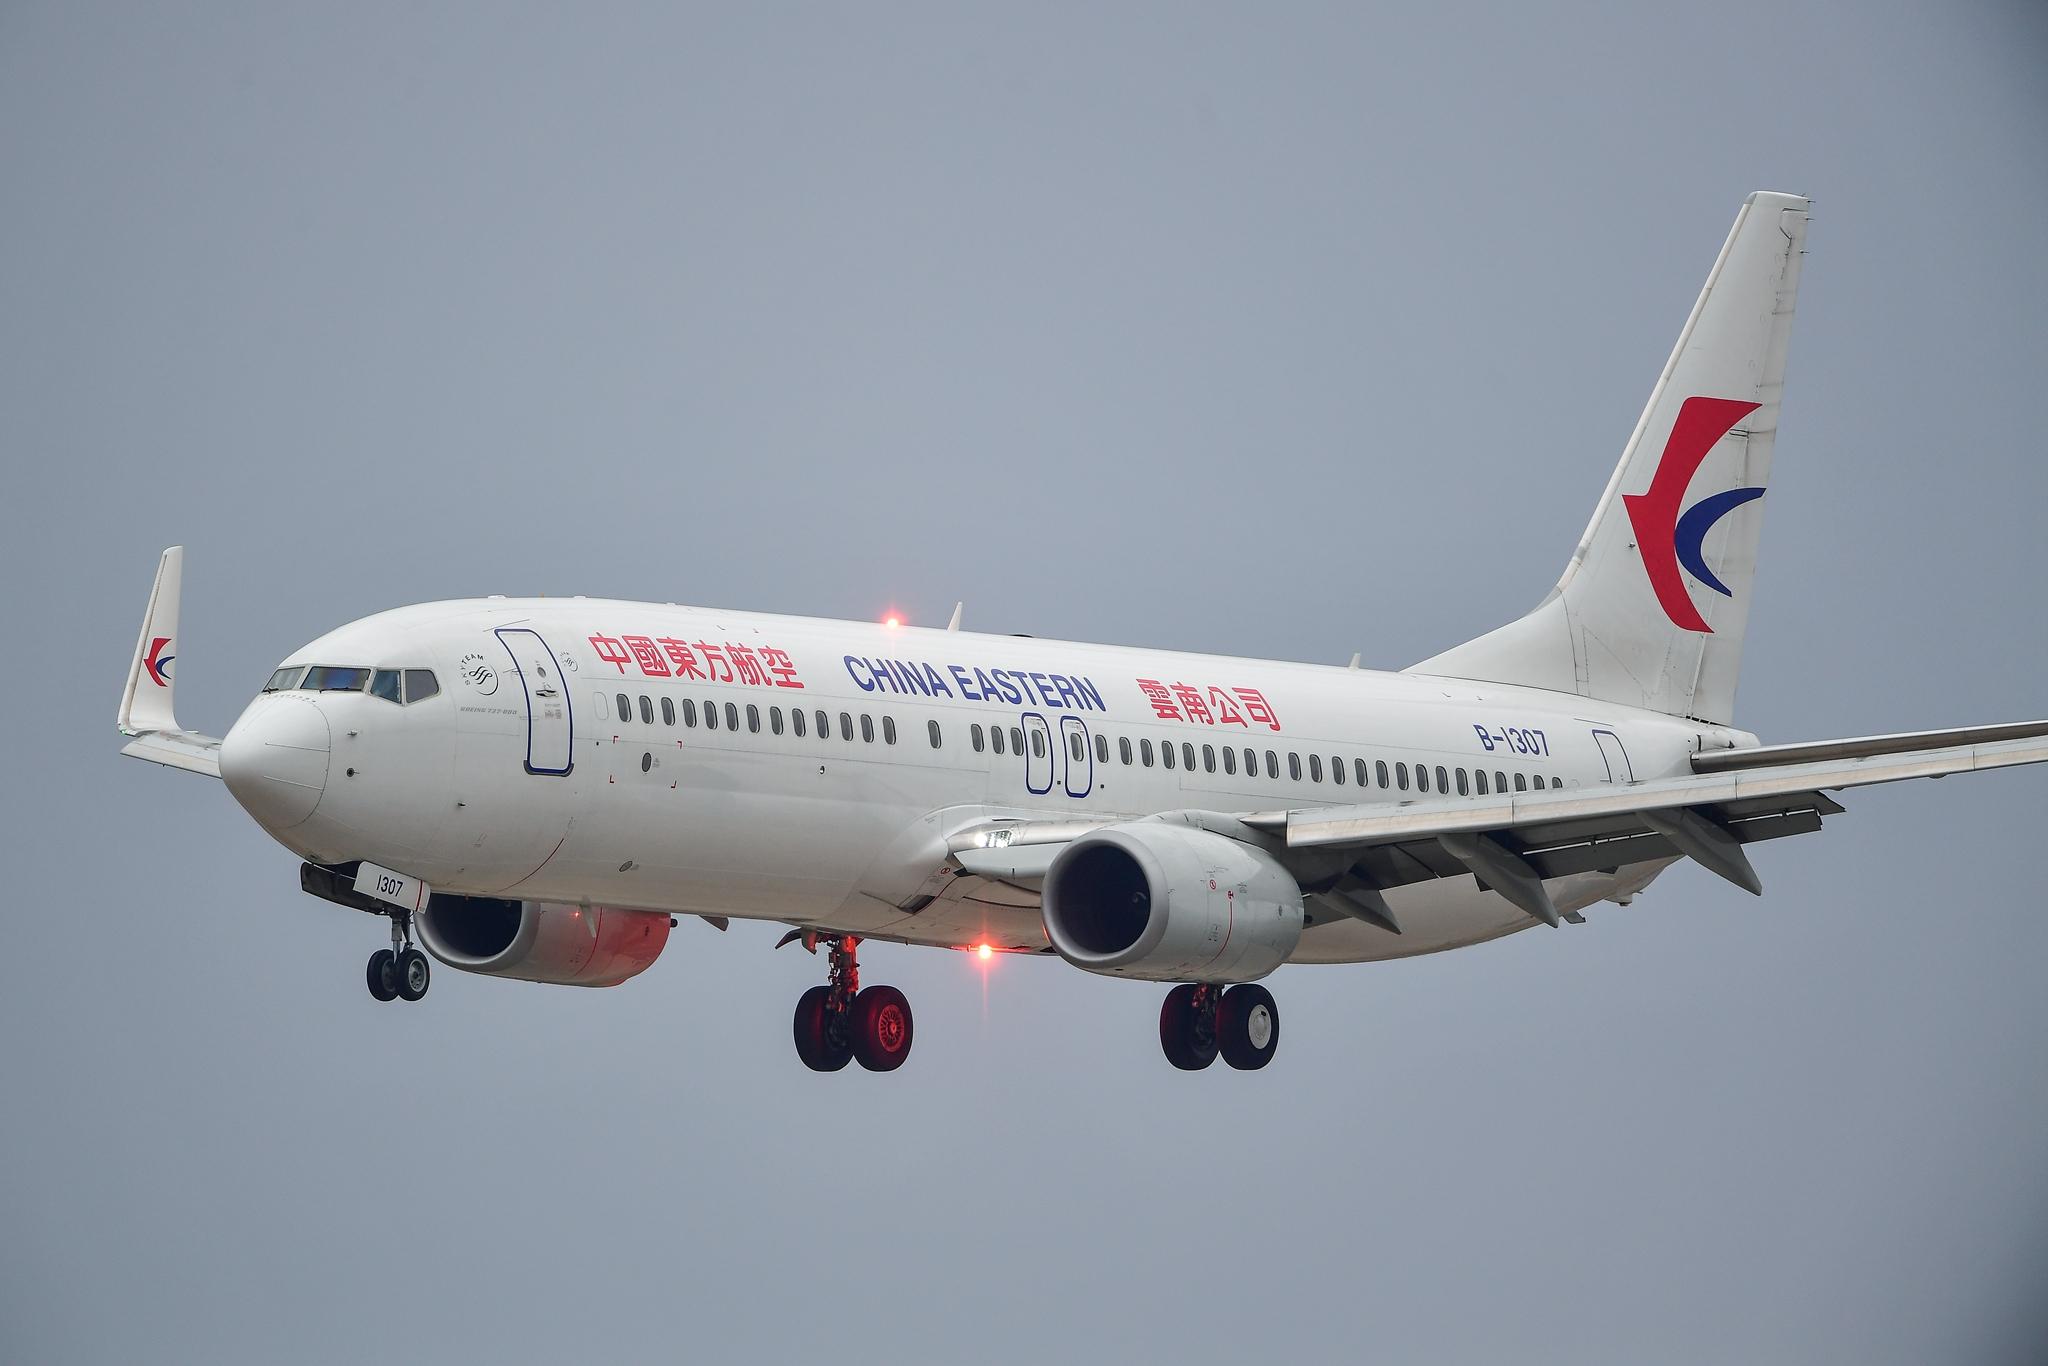 Re:[原创]KMG 庚子年初四再赴长水之约 都是似曾相识 都是熟悉的味道 BOEING 737-800 B-1307 中国昆明长水国际机场